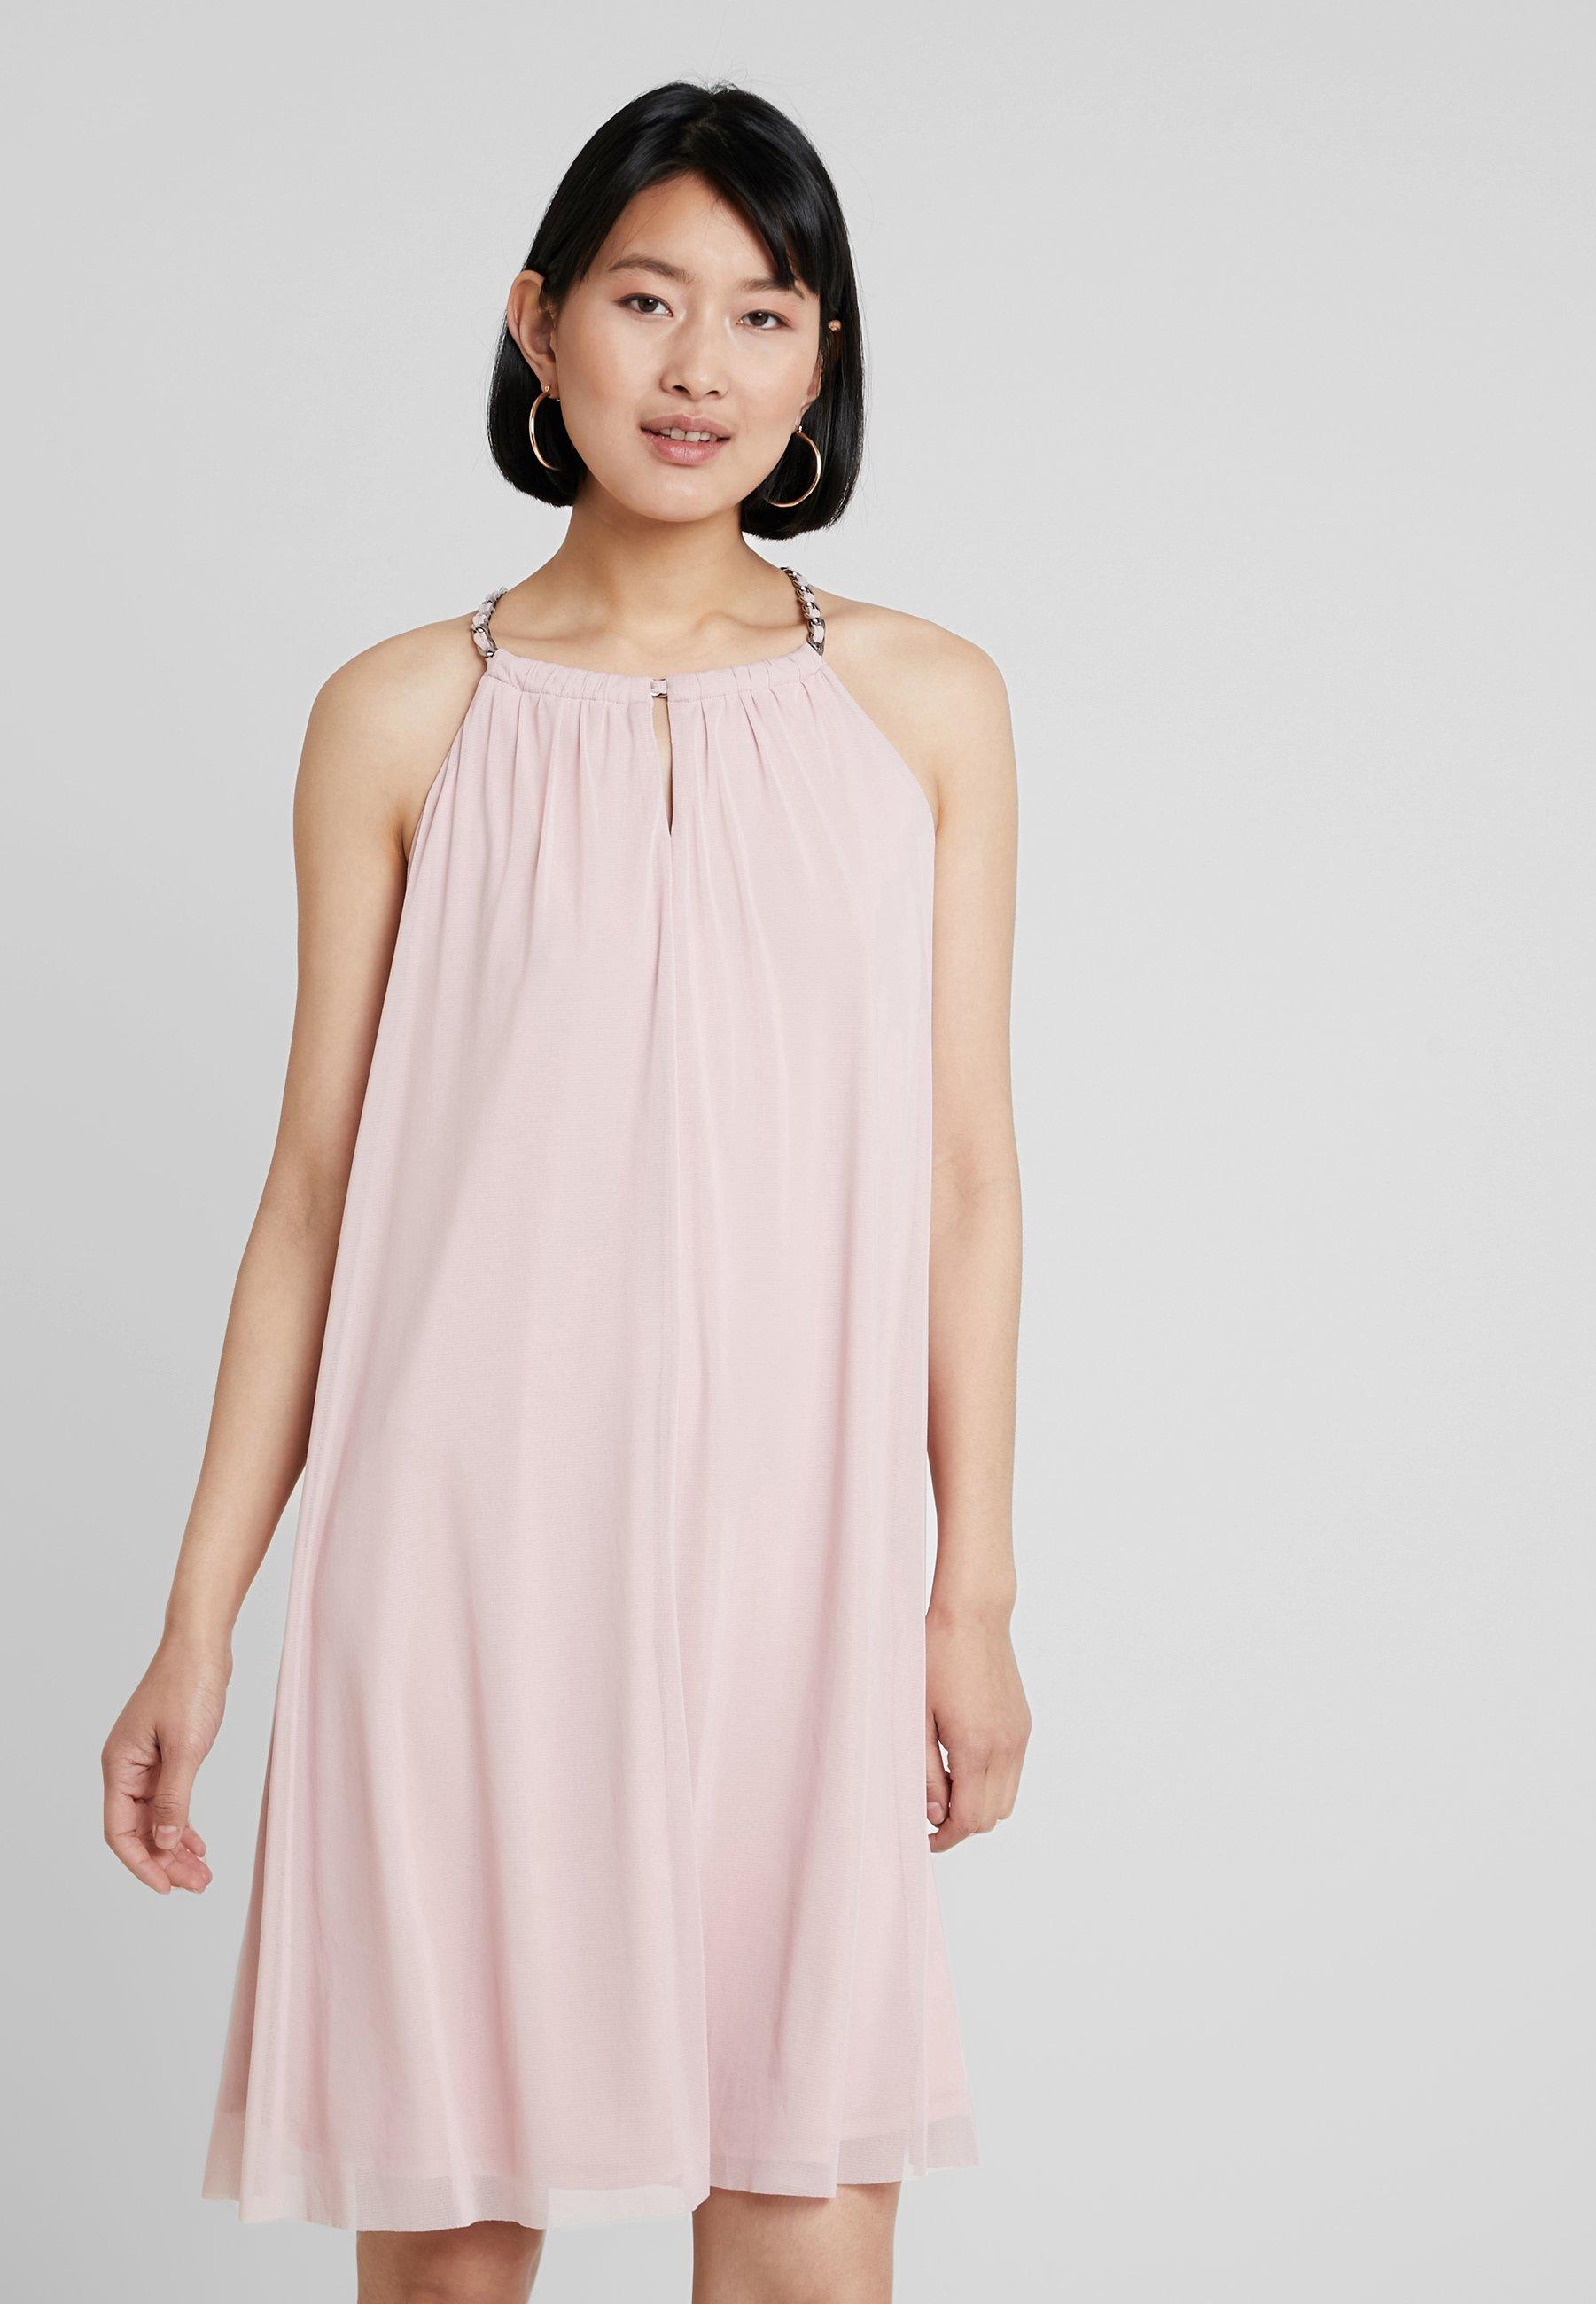 Esprit SoiréeOld Collection Robe De Pink qSMGzVpU